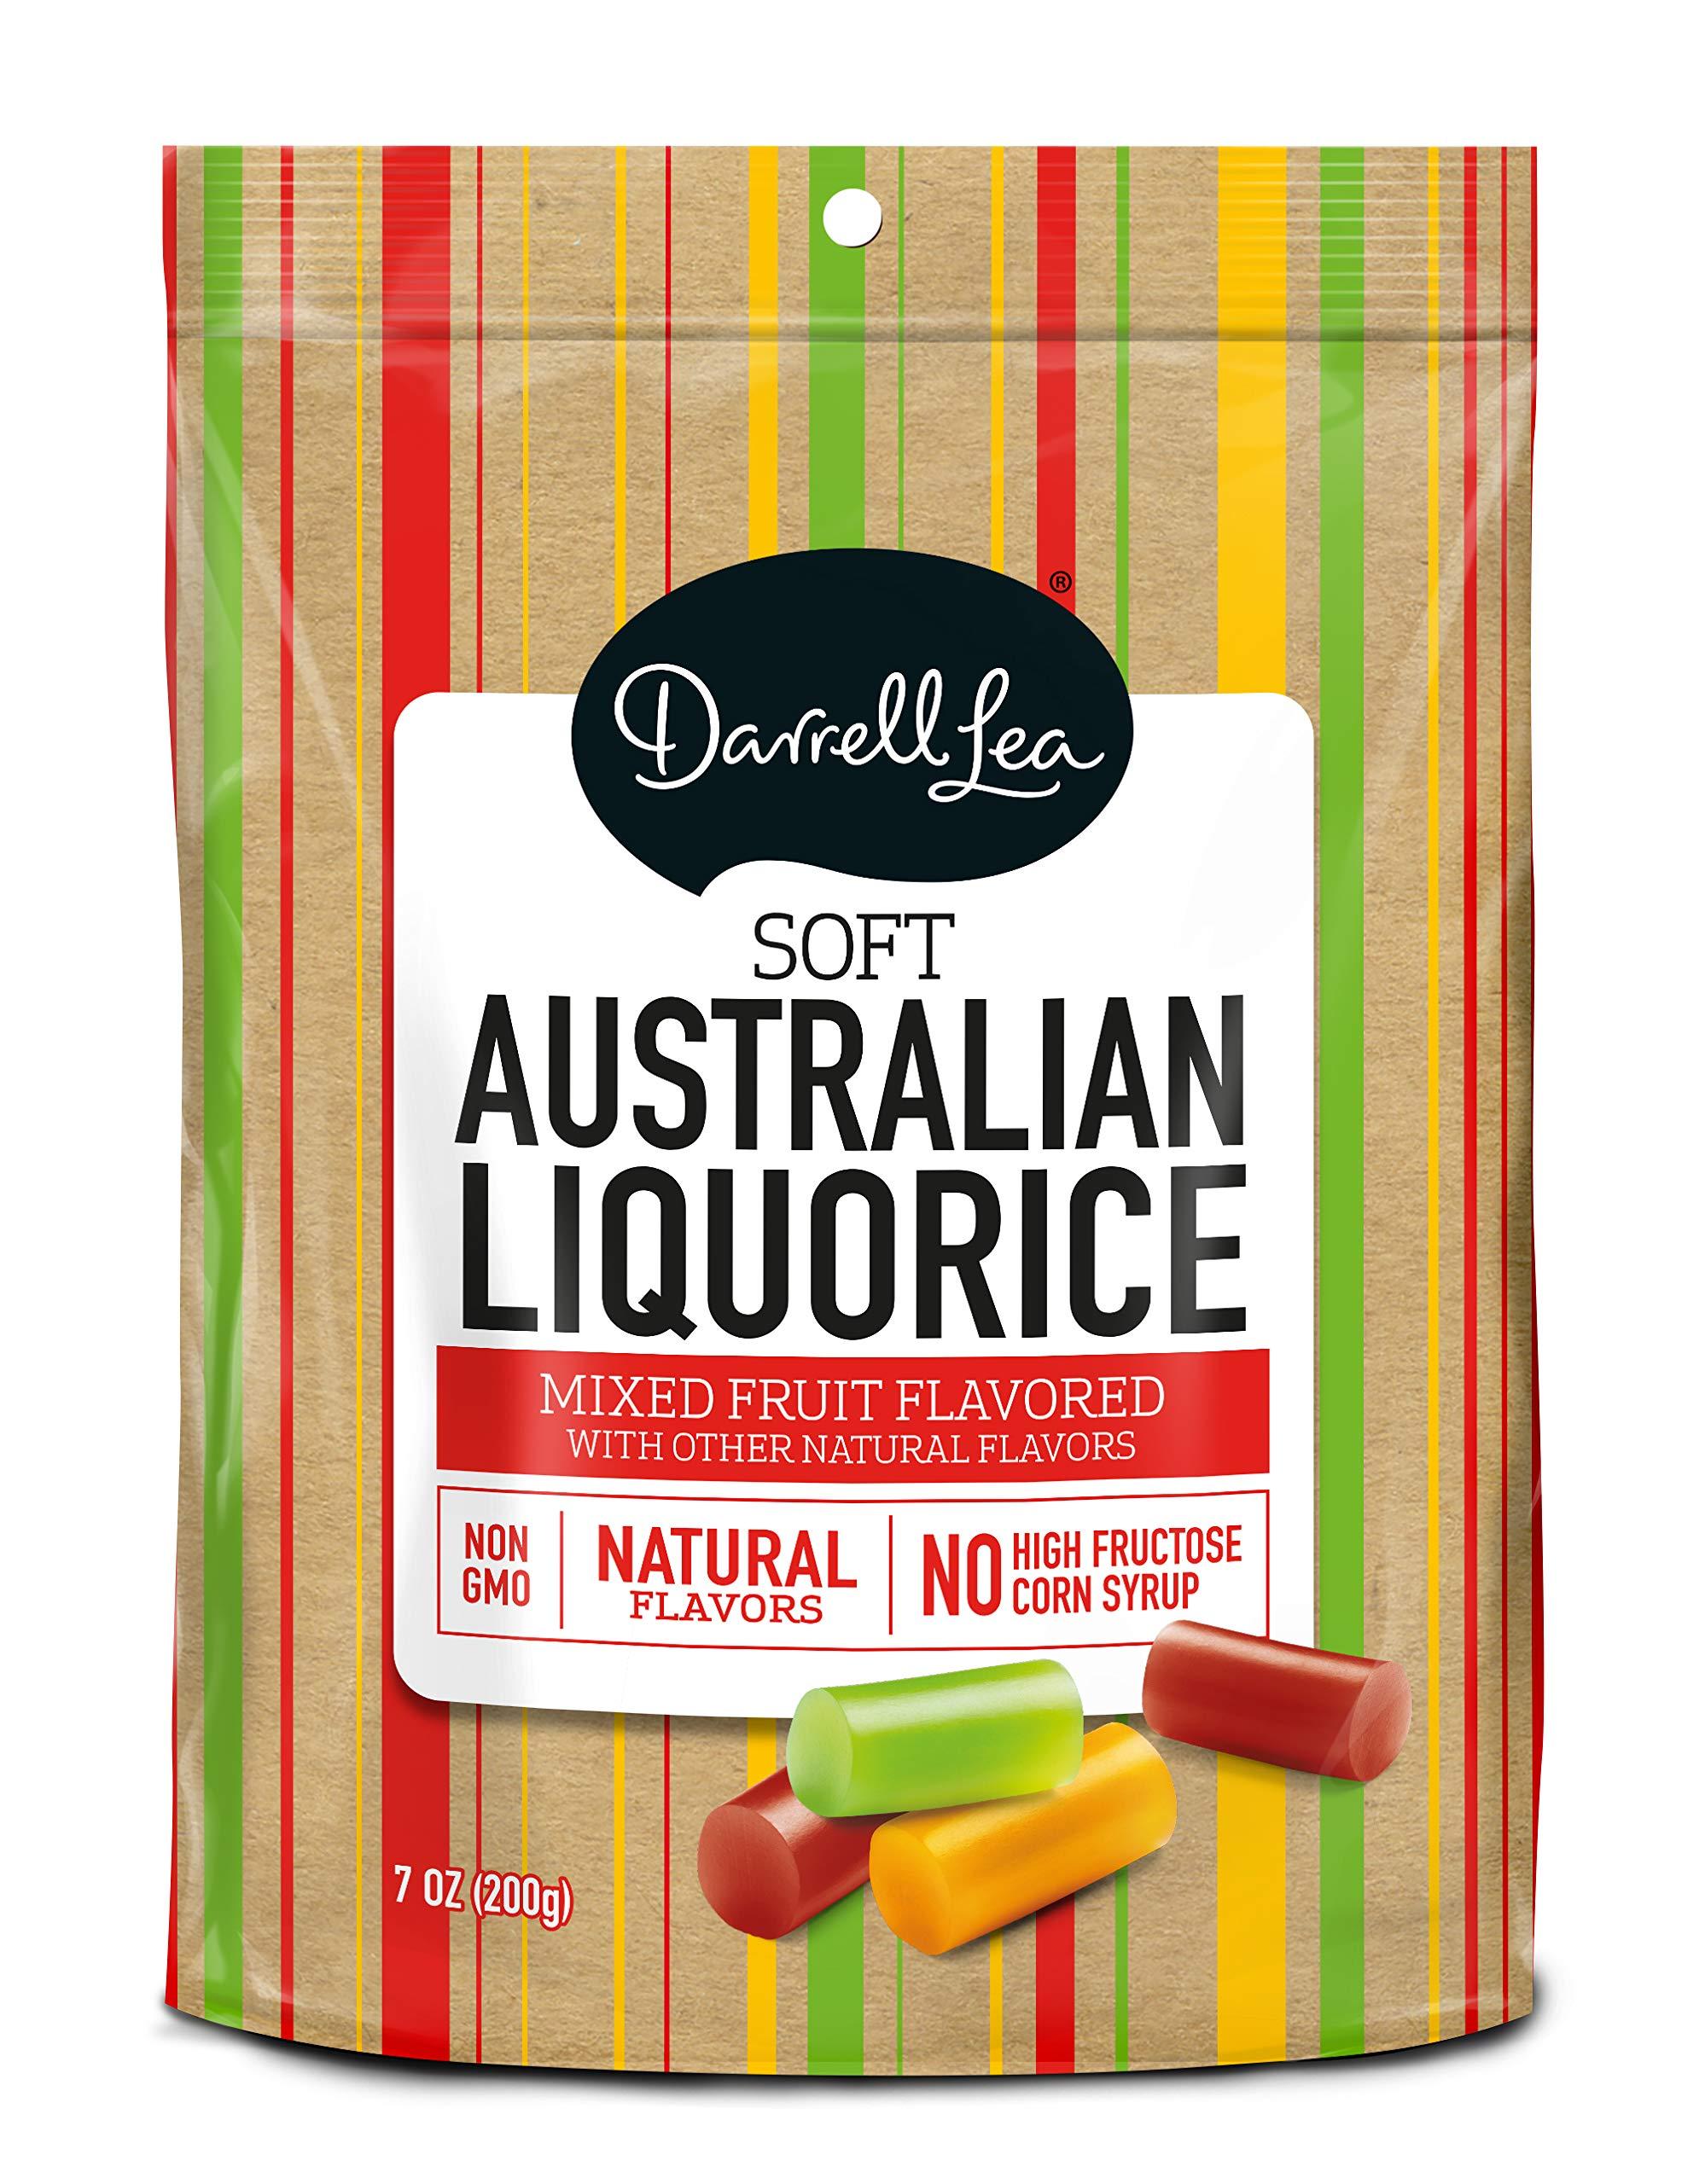 Soft Australian Mixed Fruit Licorice - Darrell Lea 7oz Bag - NON-GMO, NO HFCS, Vegetarian & Kosher   America's #1 Soft Eating Licorice Brand!